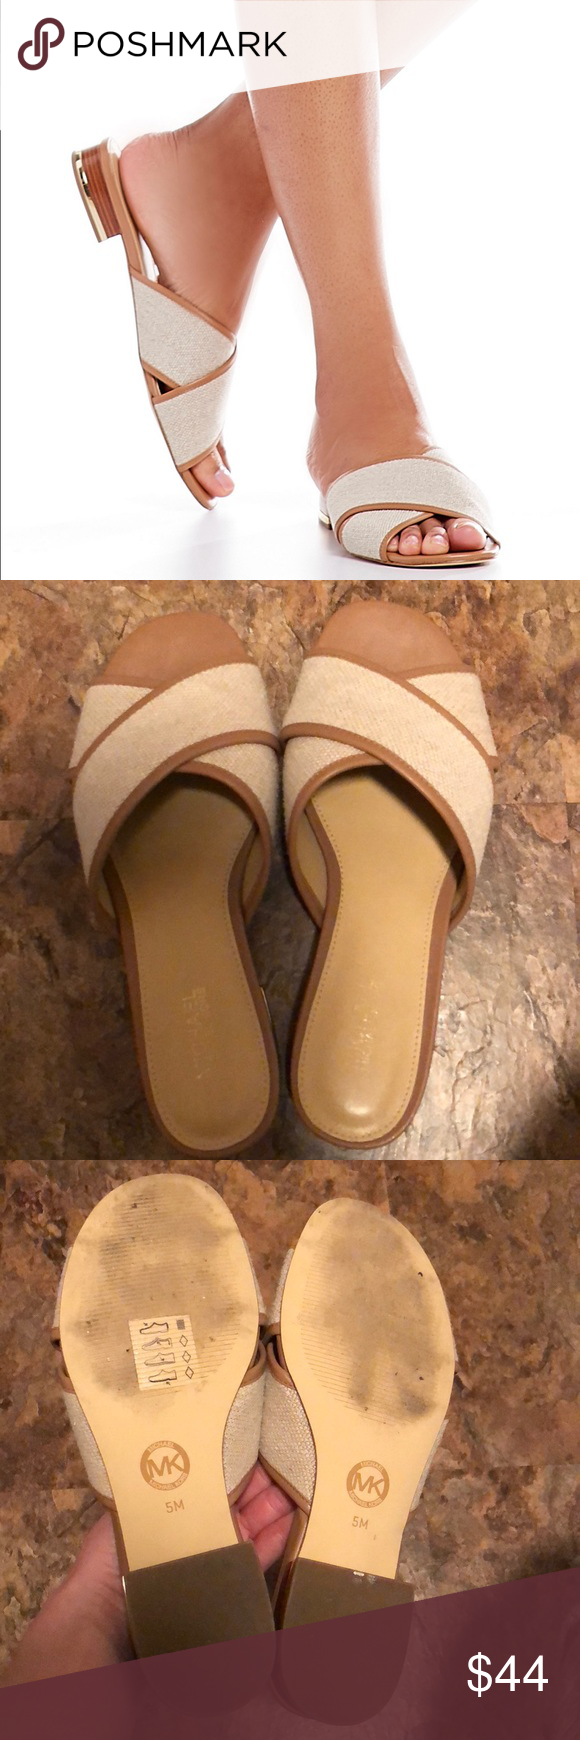 7cec03138e9f MICHAEL Michael Kors Shelly Slide MICHAEL Michael Kors Shelly Flat Block  Heel Sandal. Genuine leather